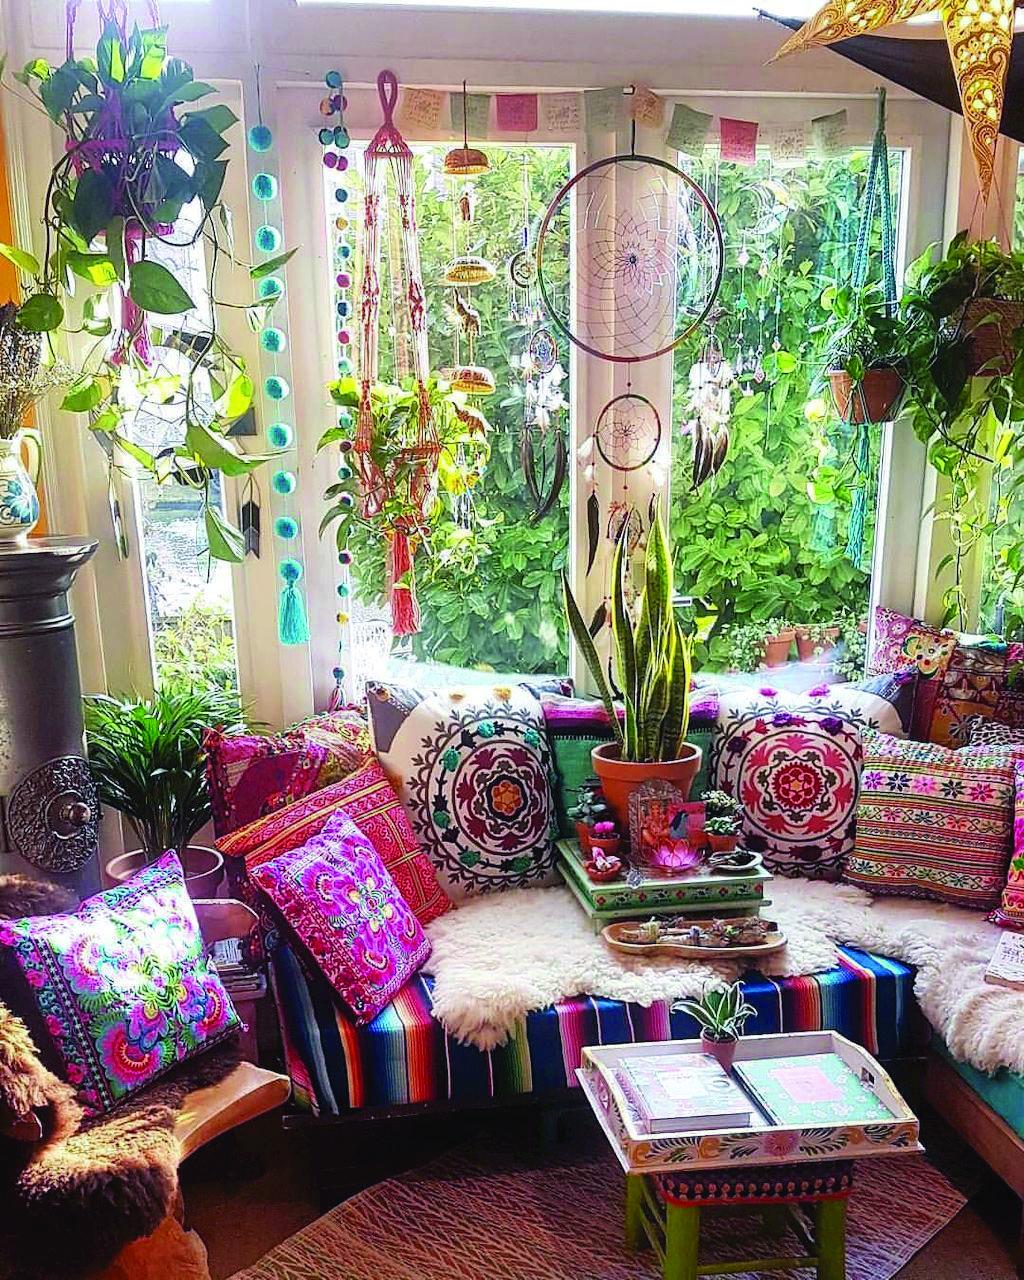 rustic bedroom ideas  boho living room decor boho room